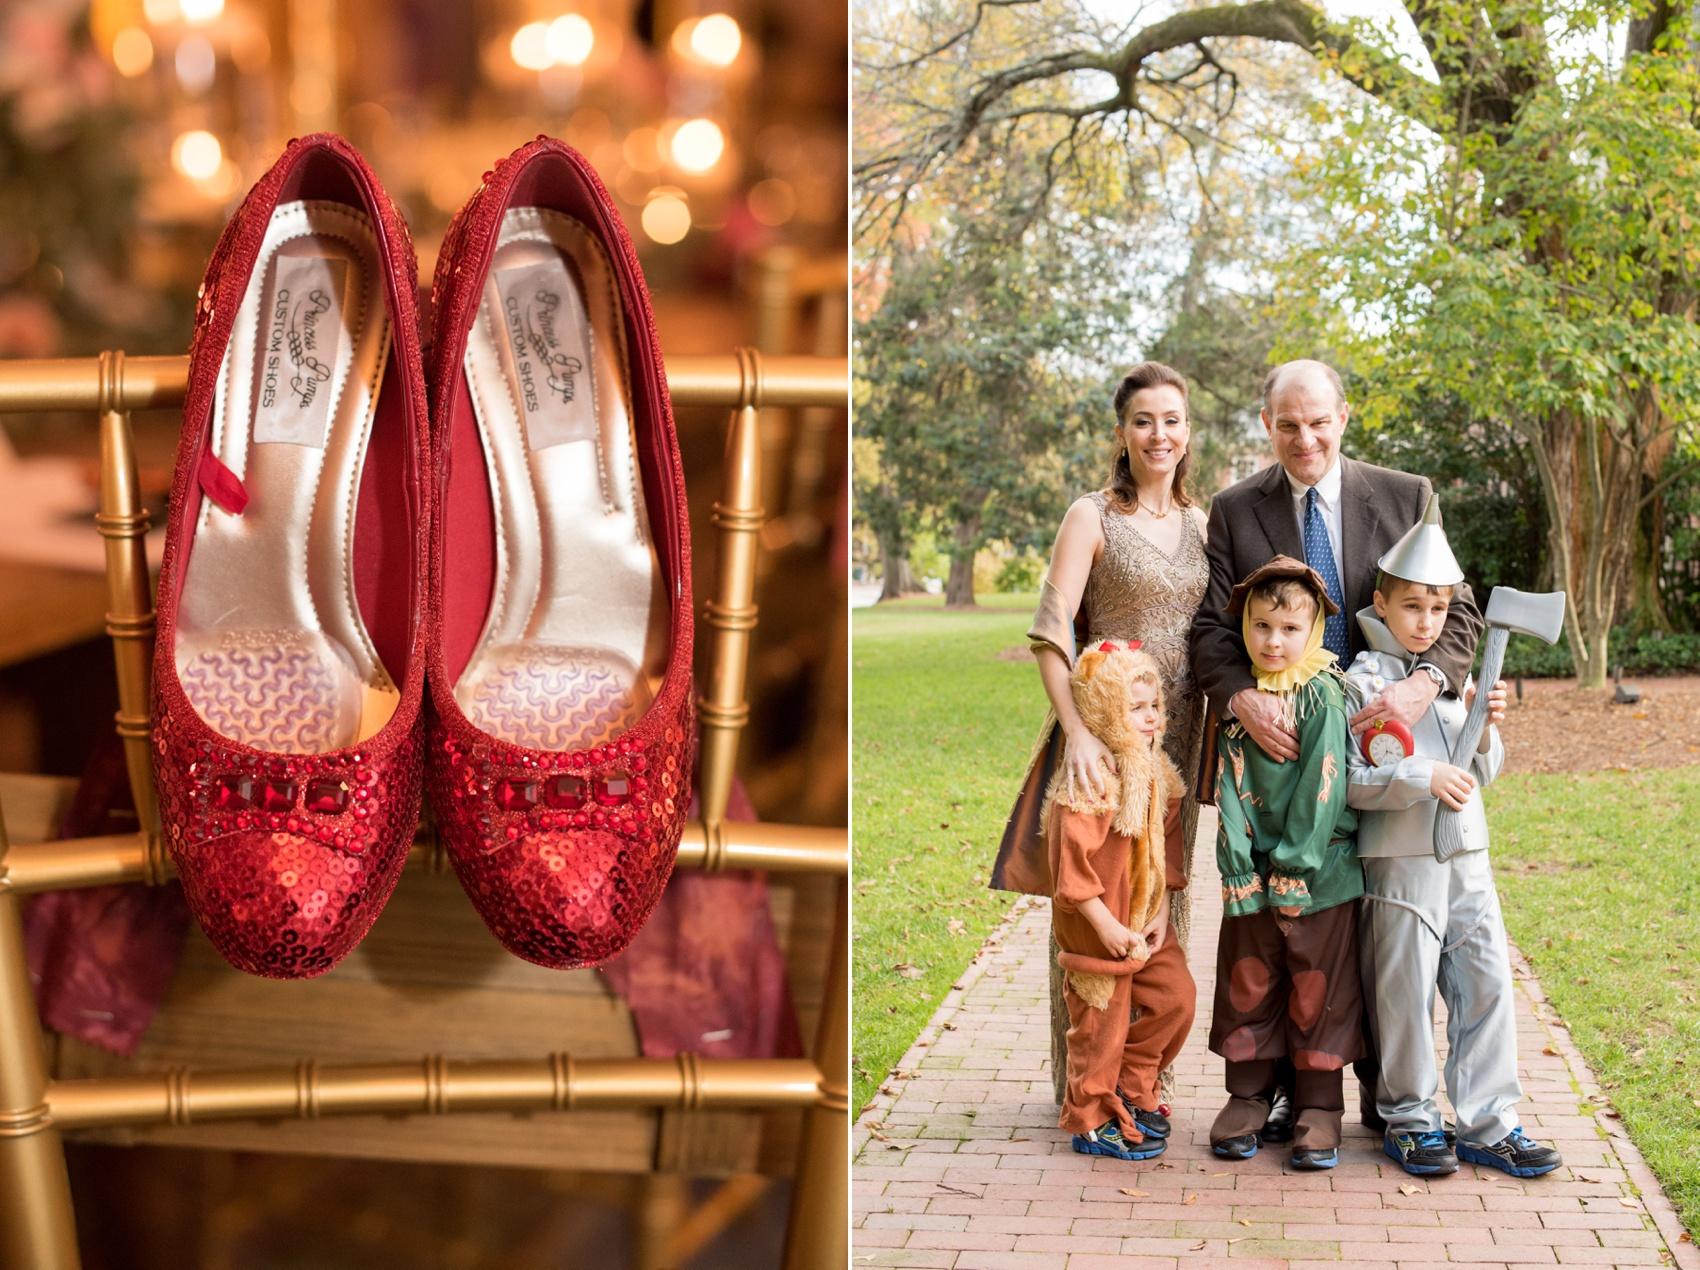 The Carolina Inn wedding photos by Mikkel Paige Photography, Raleigh wedding photographer. Planning by A Swanky Affair for Halloween day!